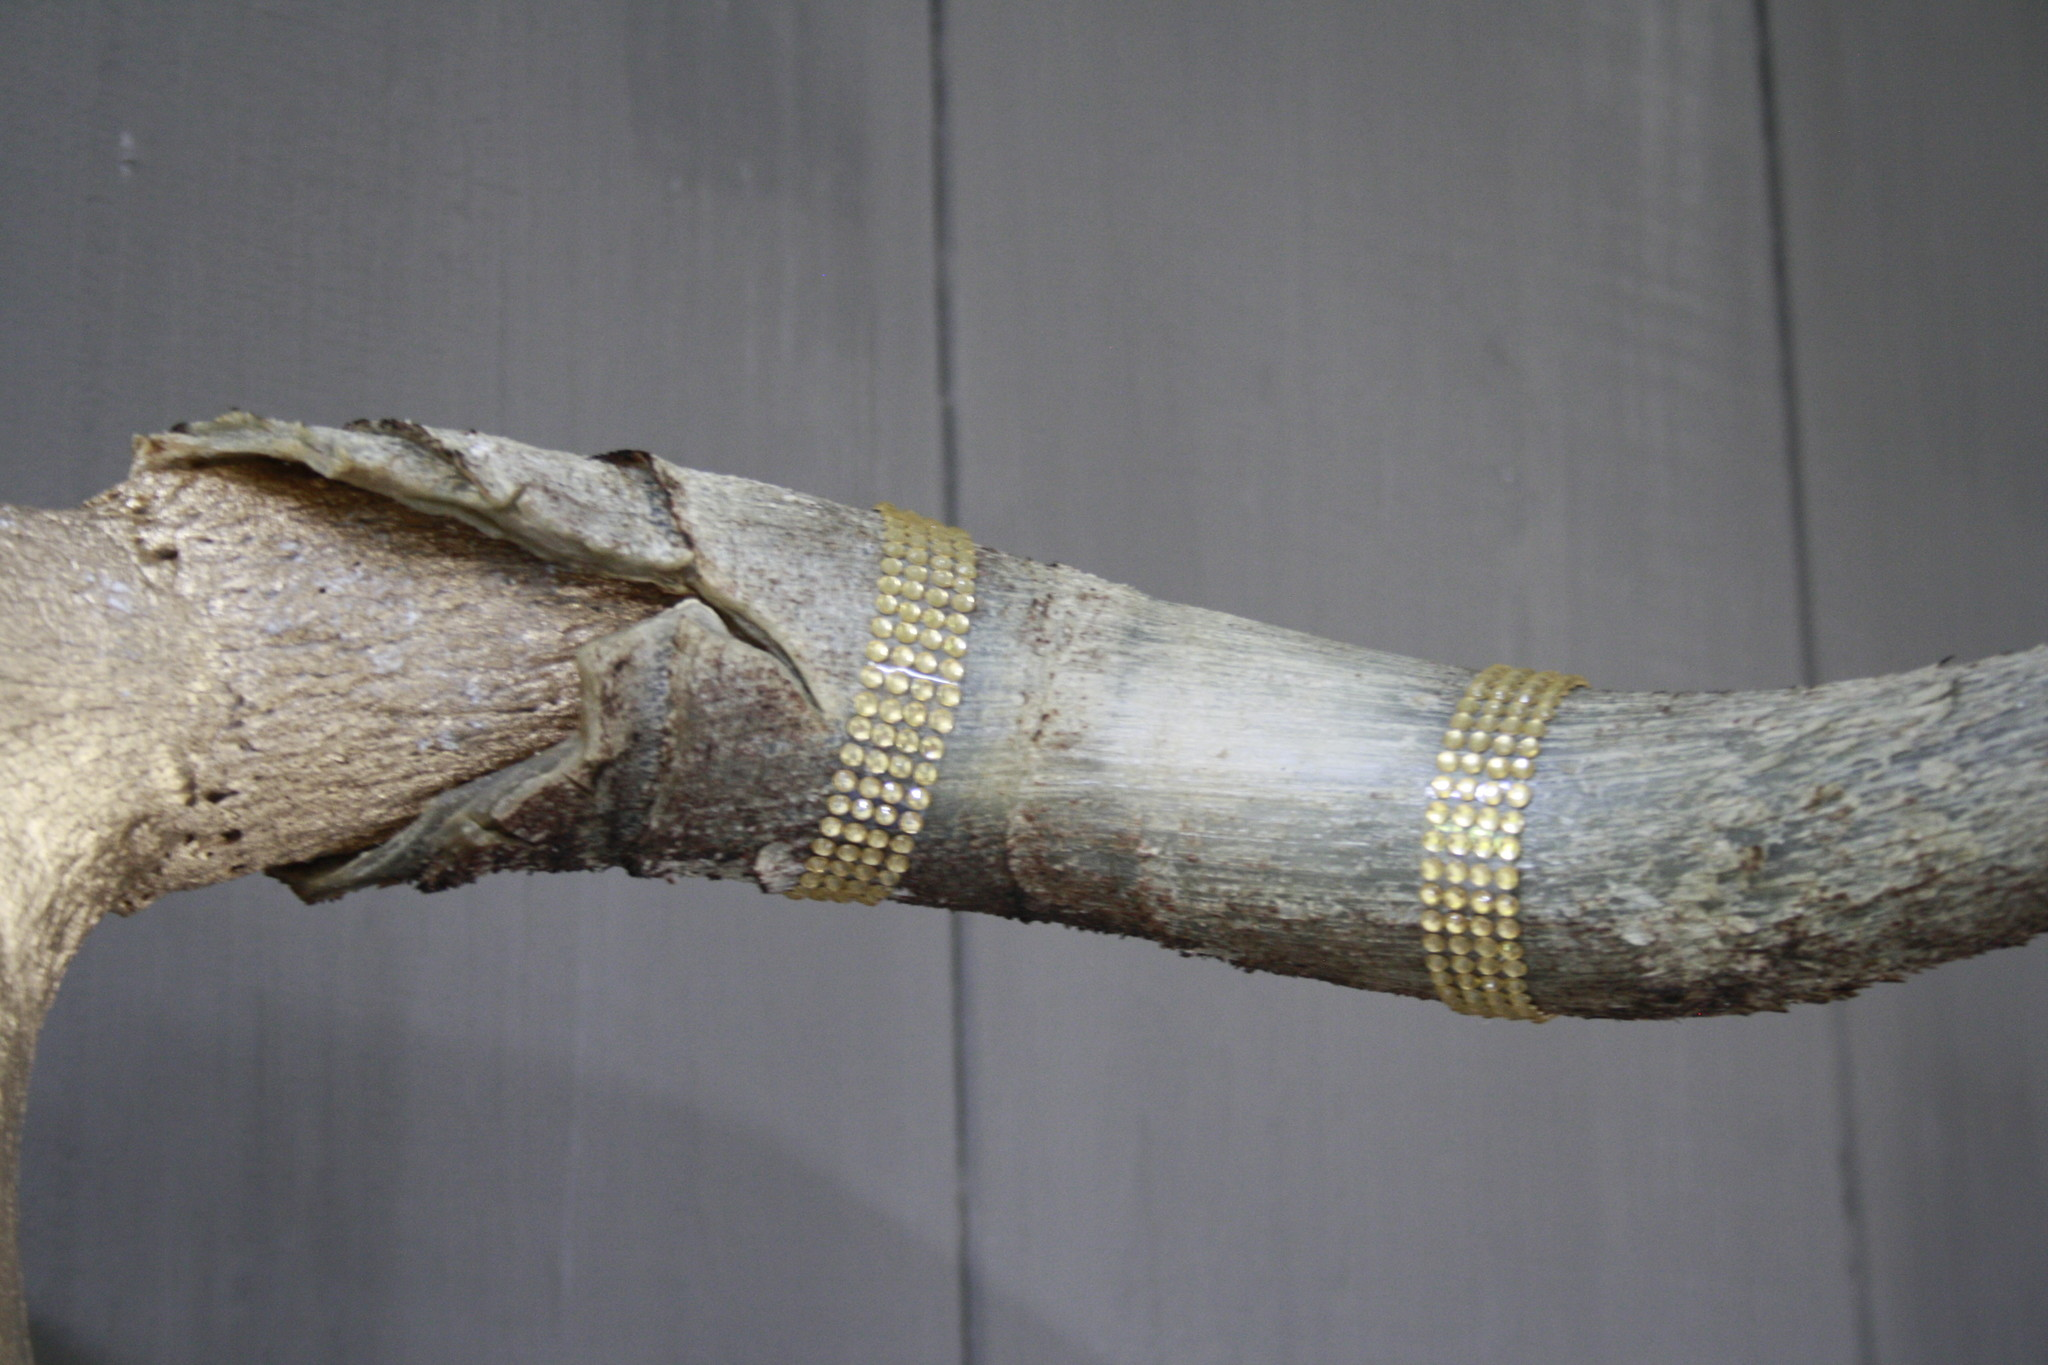 Longhorn Schedel Goud Met Hoorns 63 x 44 cm - Copy-5